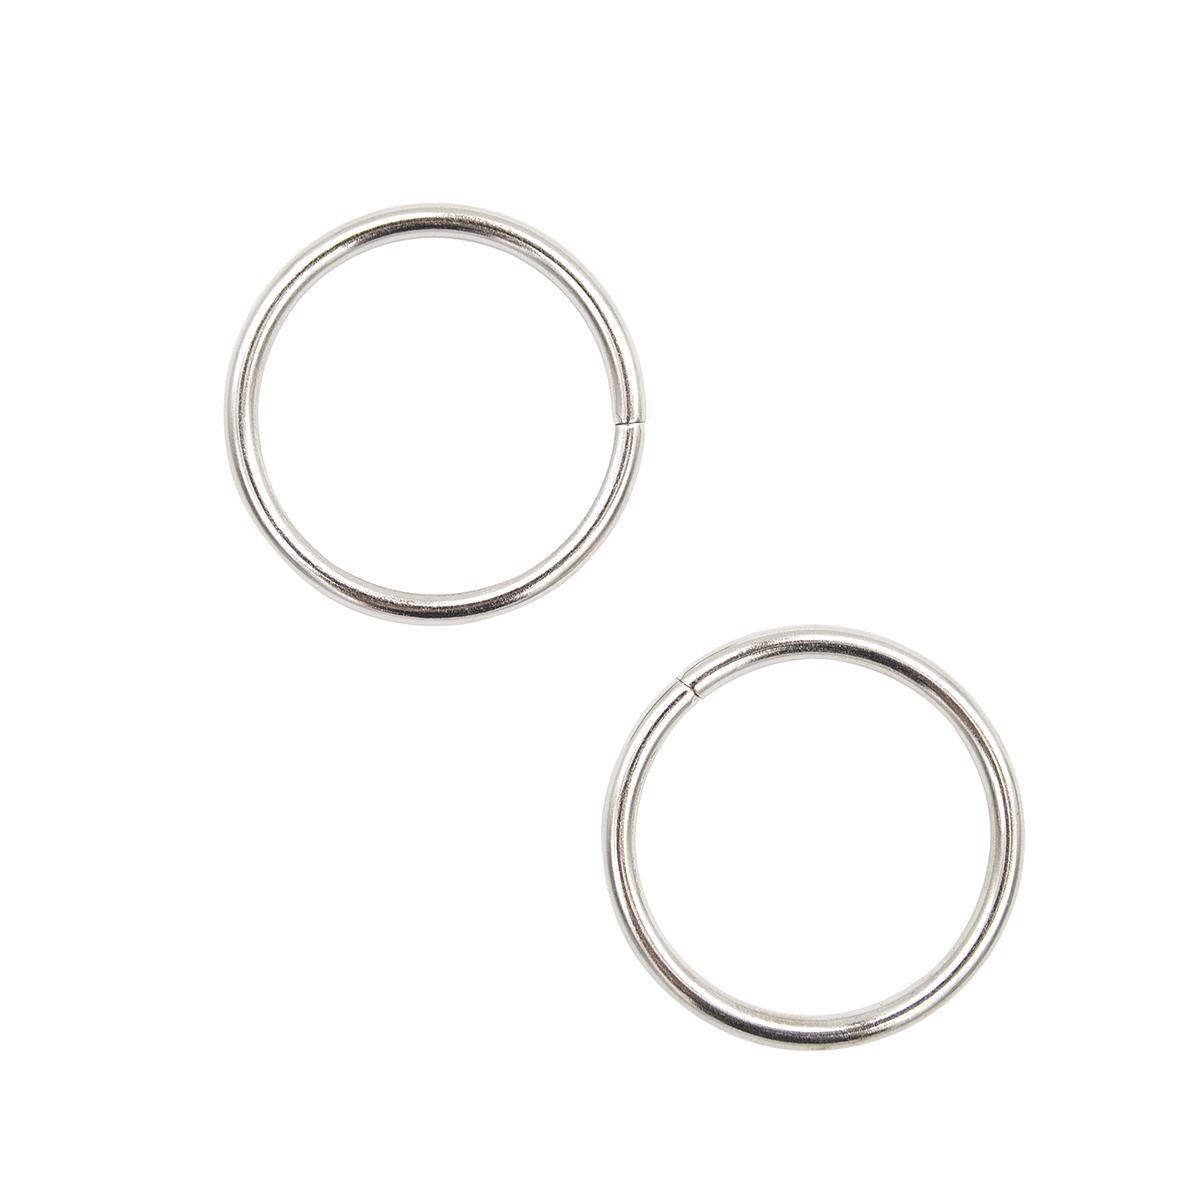 816-011 Кольцо разъемное, 40*4,0 мм, упак./2 шт., Hobby&Pro